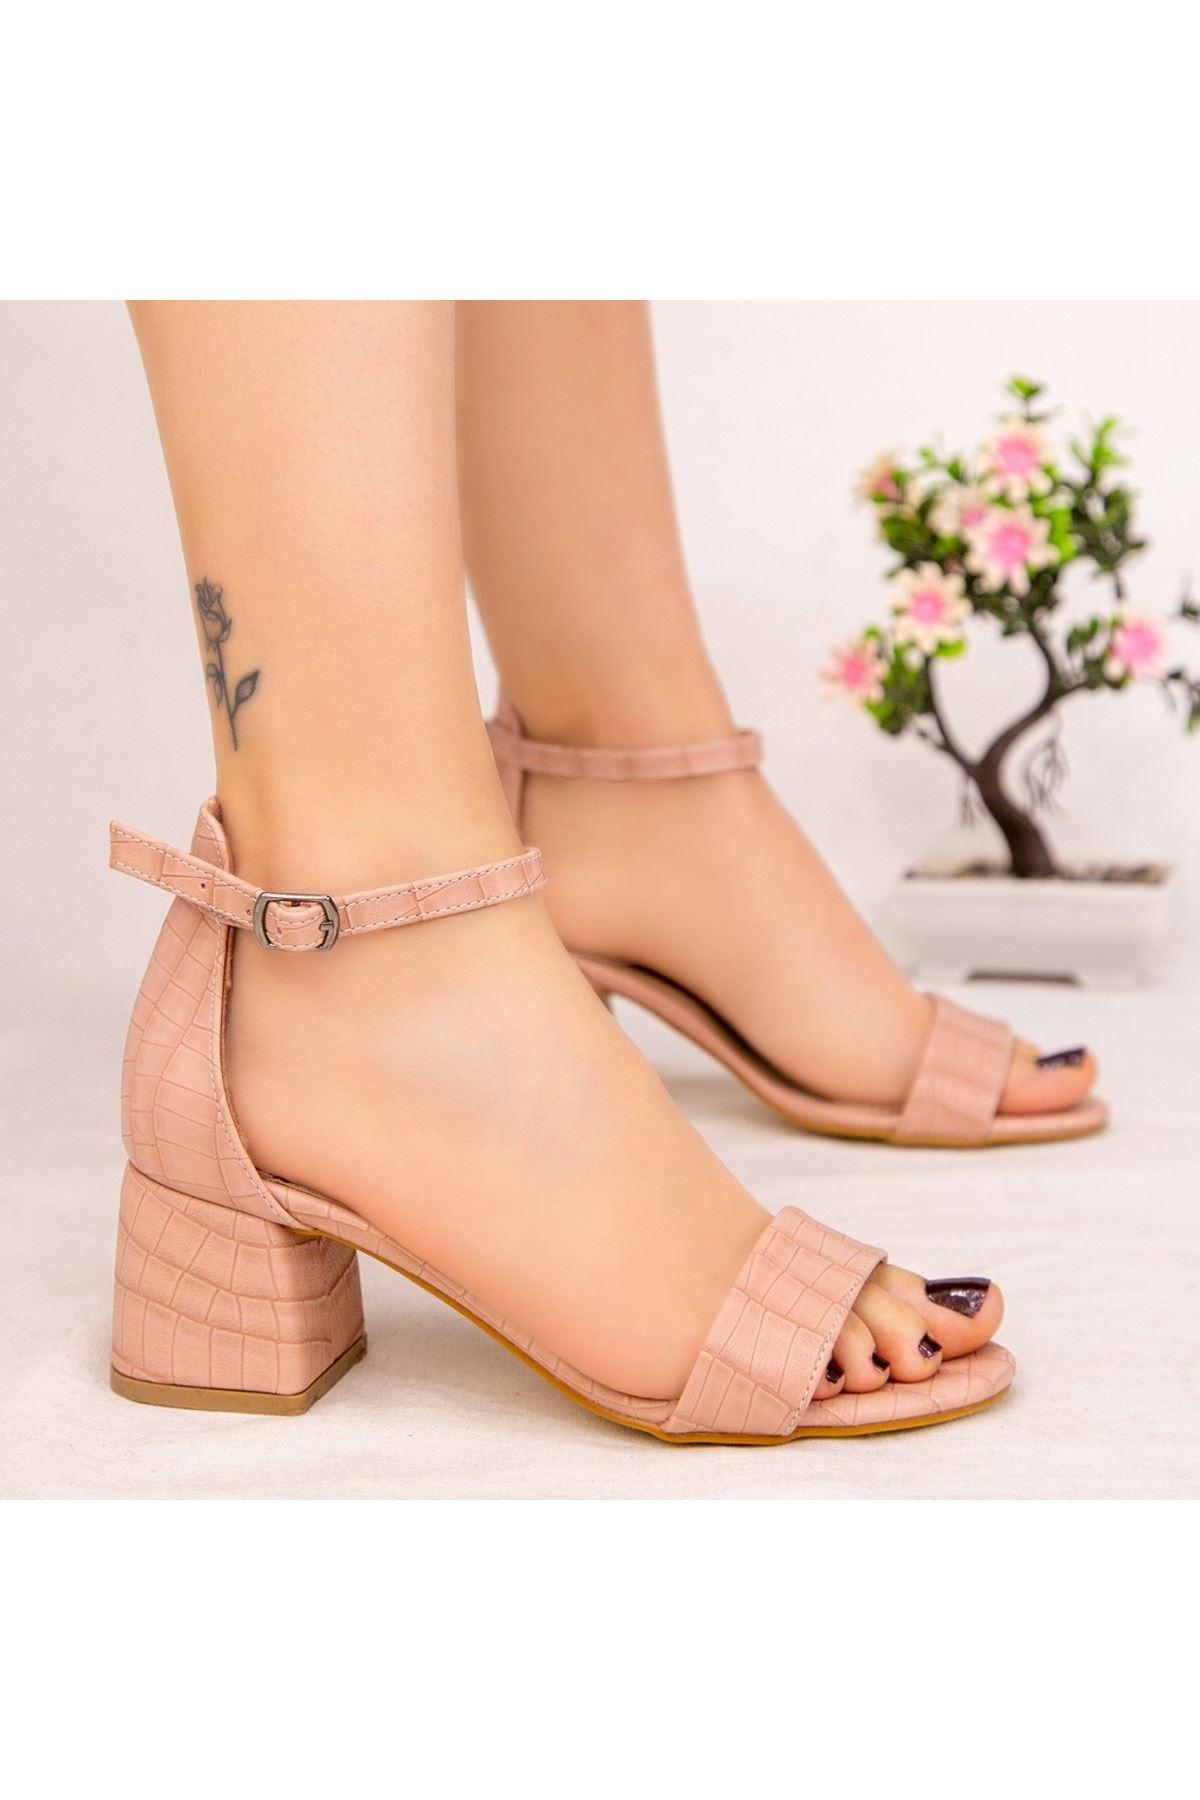 Epon Pudra Cilt Desenli Tek Bant Topuklu Ayakkabı